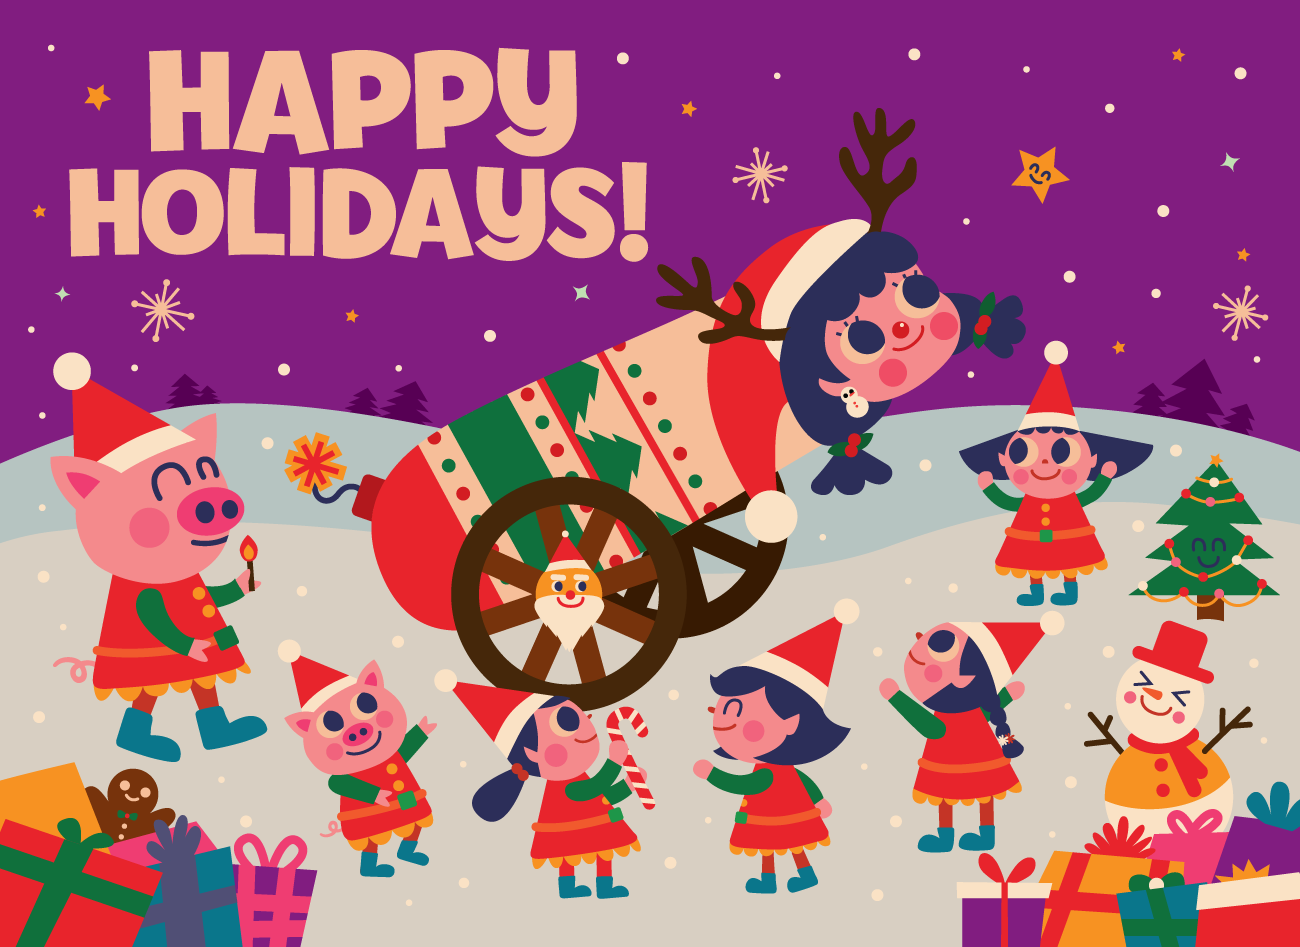 Christmas-card_Uijung-Kim_web_1300.png